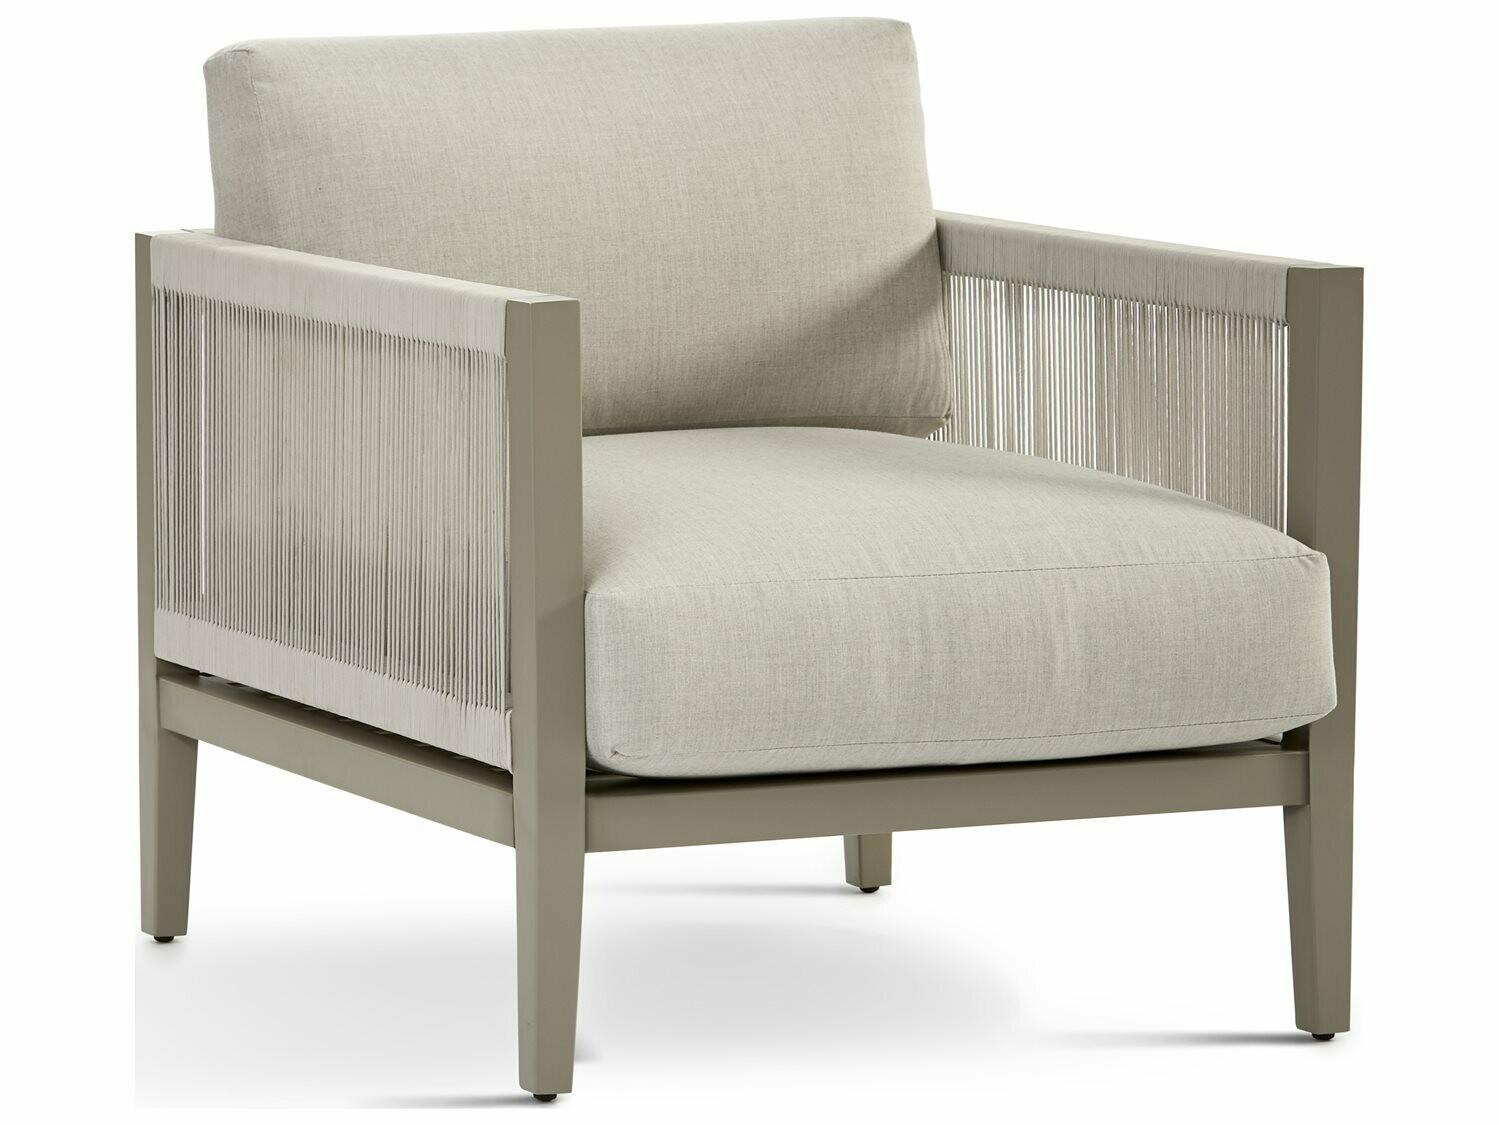 South Sea Rattan Nicole Aluminum Greystone Lounge Chair